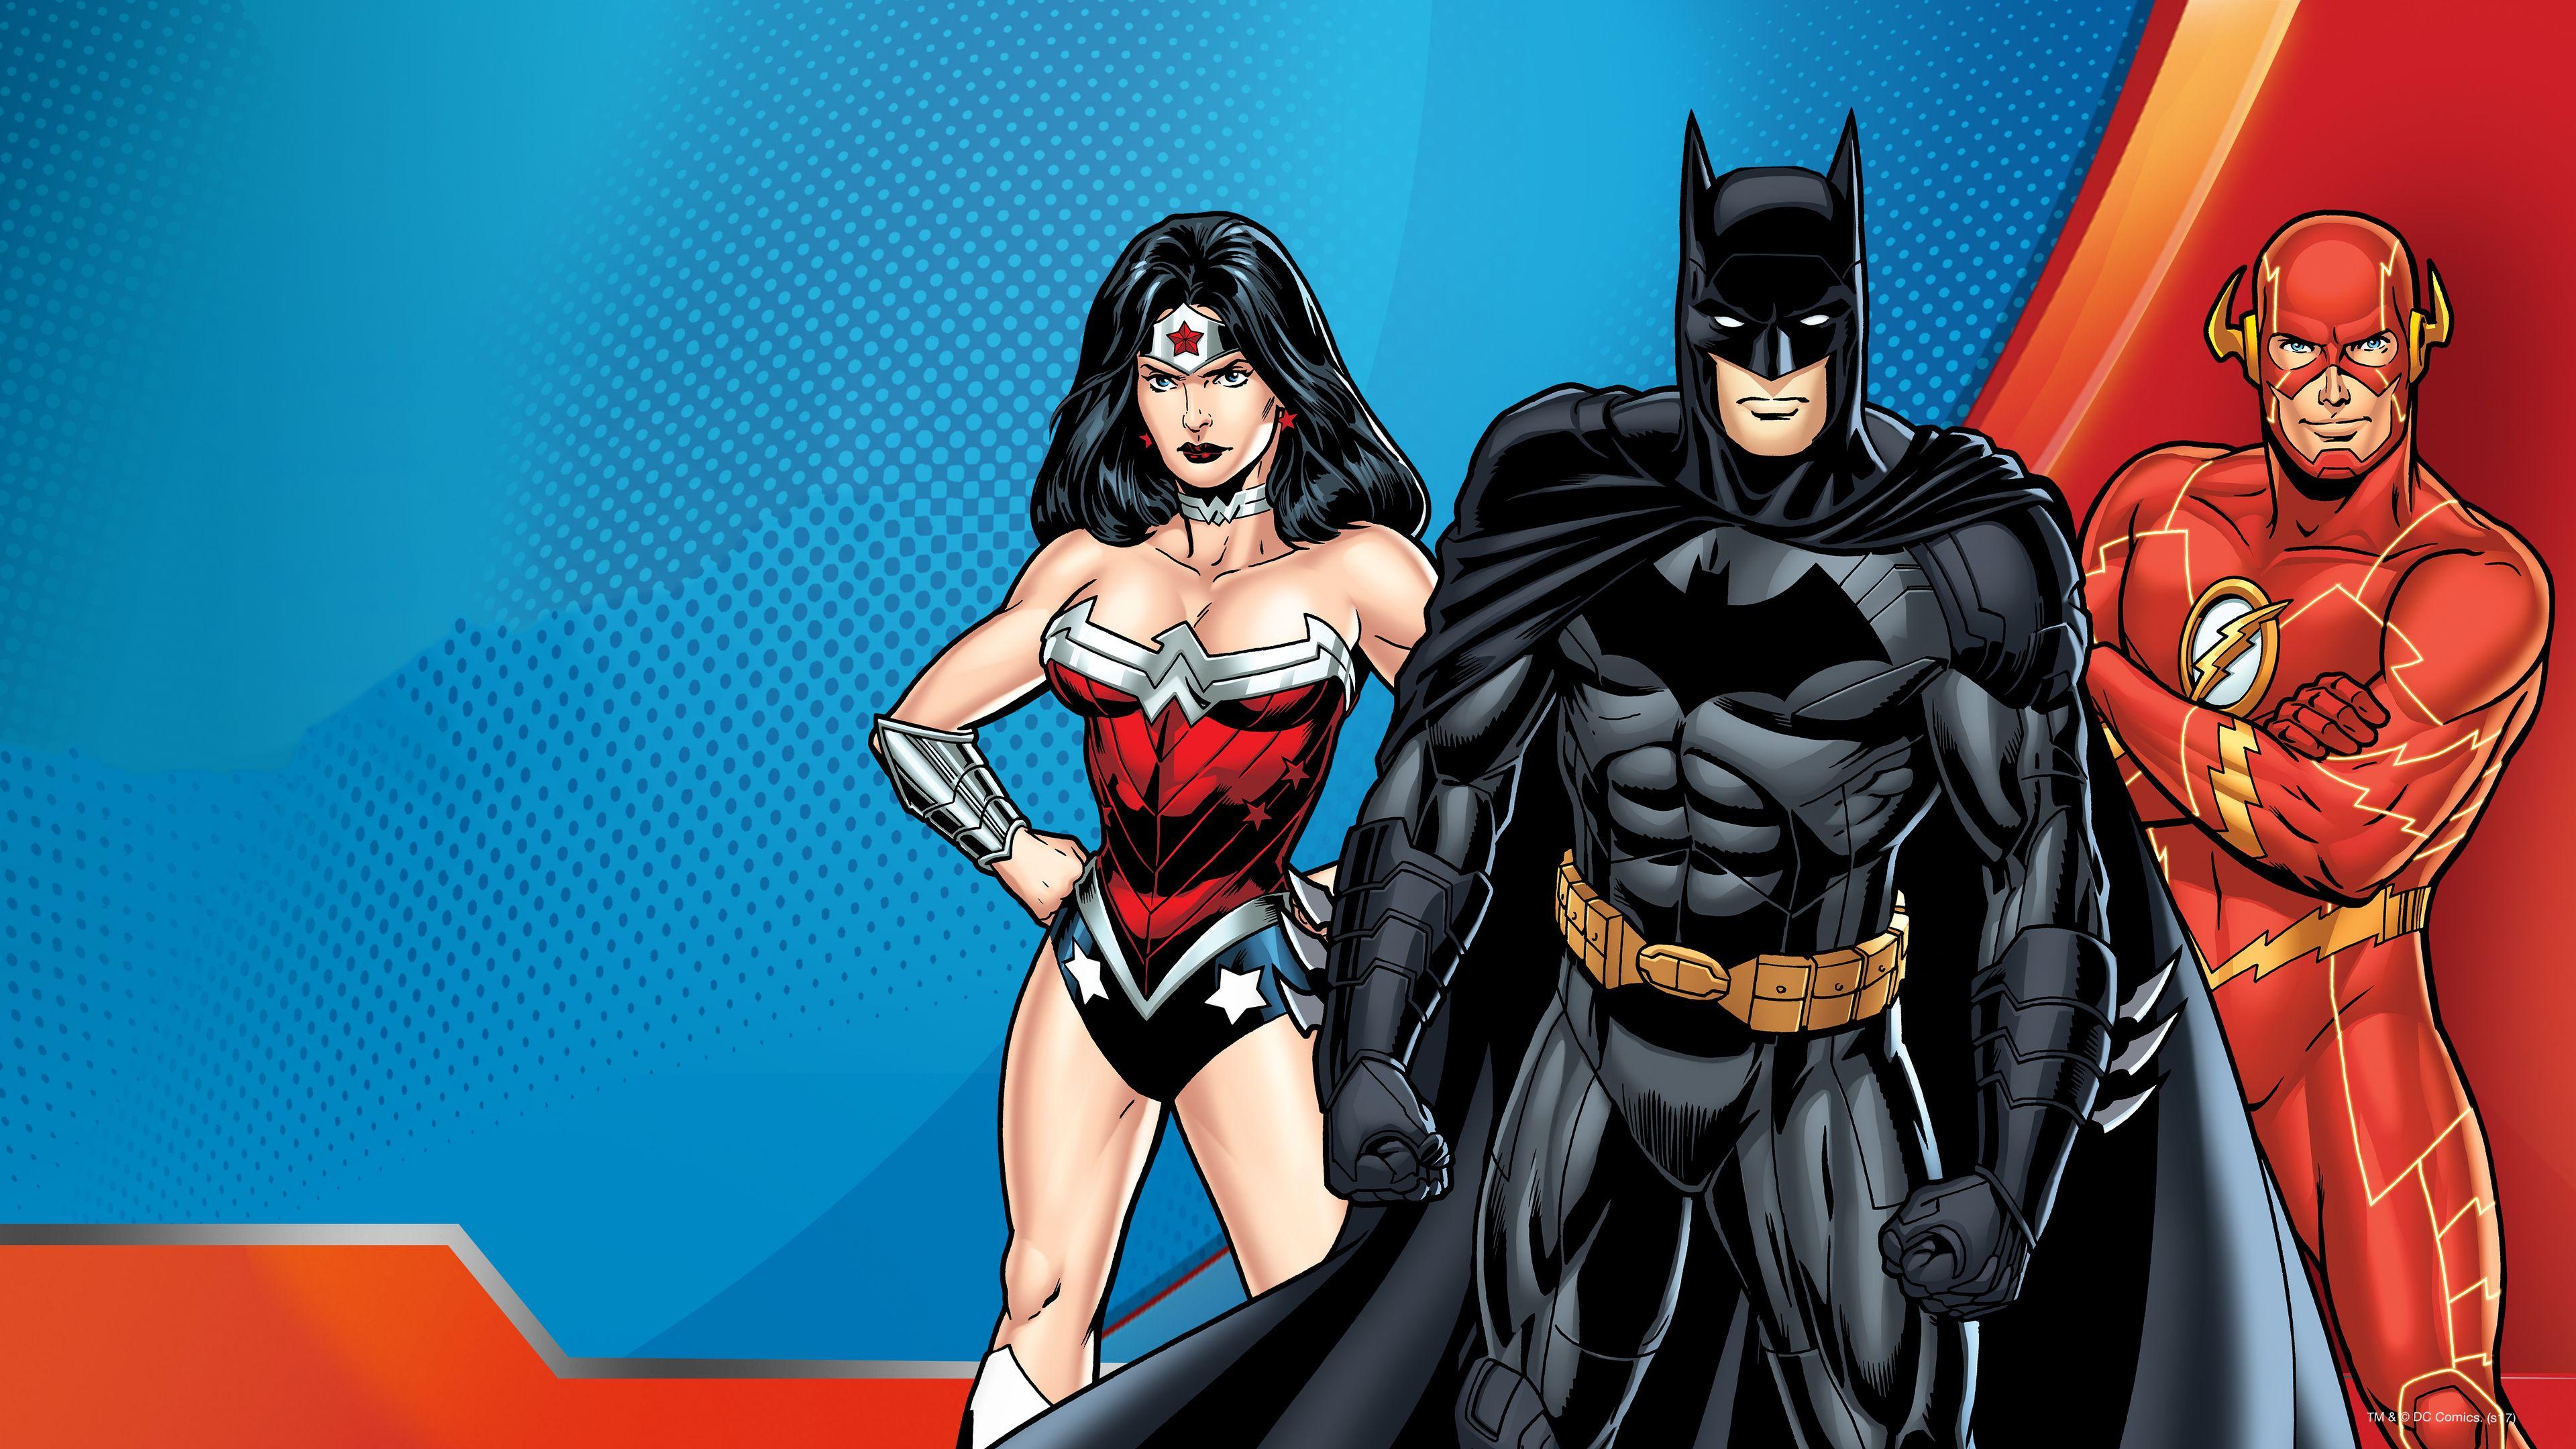 Batman Flash Wonder Woman Dc Superheroes Comic Art 4k Wonder Woman Wallpapers Superheroes Wallpapers Hd Wallpapers F Wonder Woman Superhero Batman Wallpaper